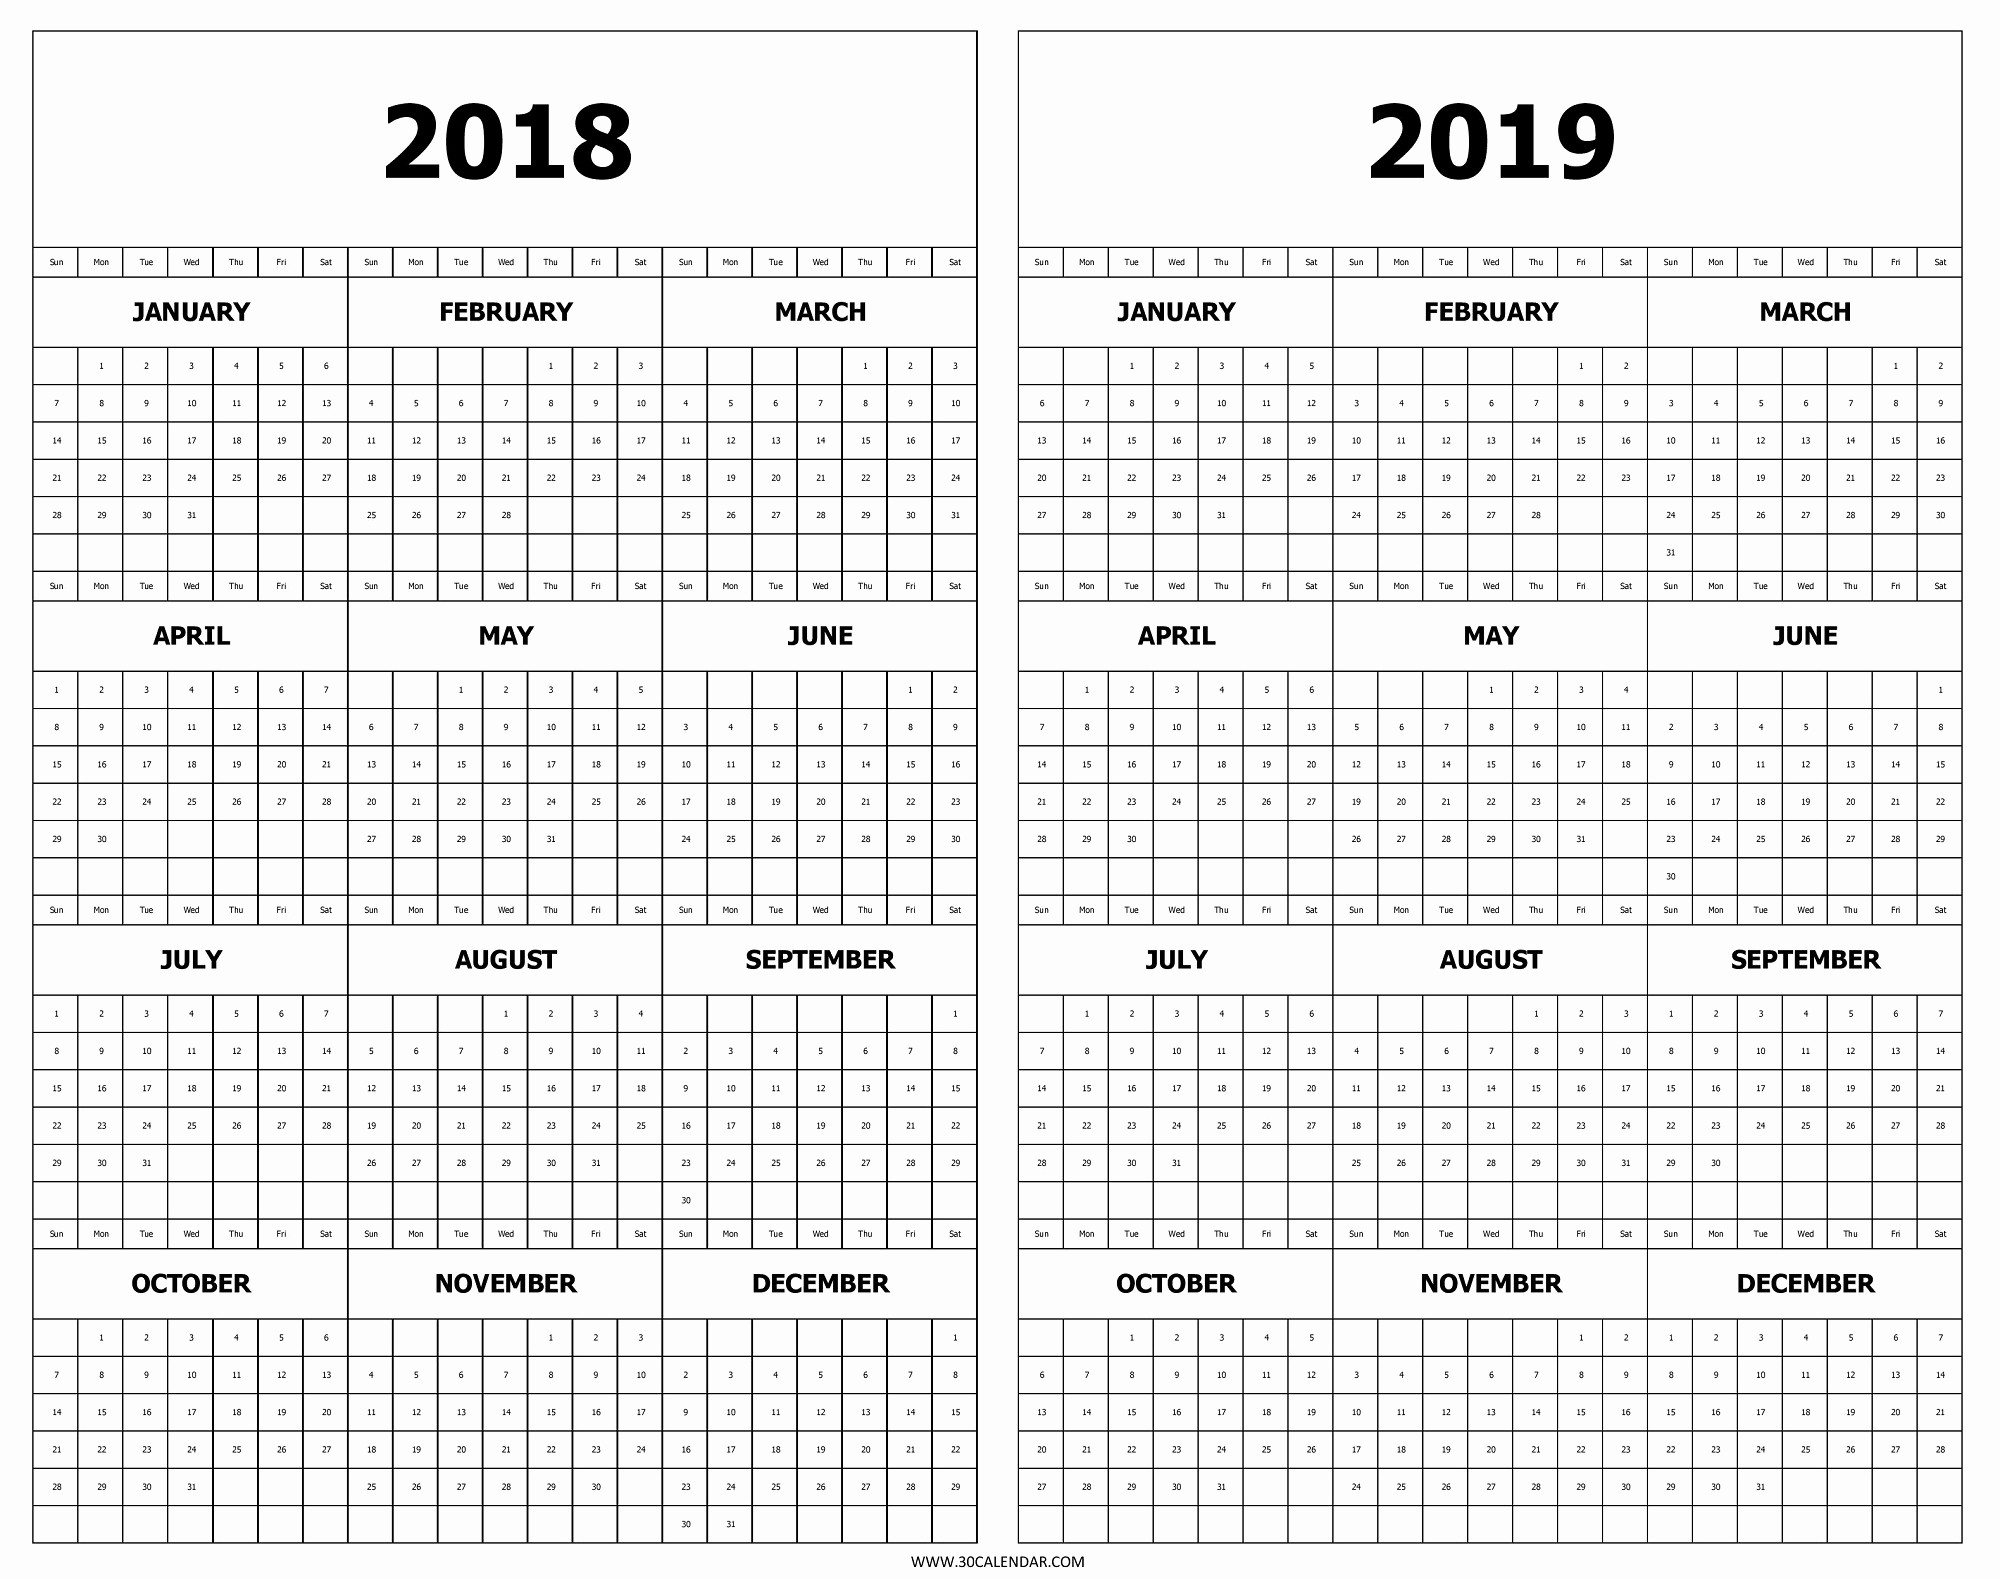 Printable 2018 and 2019 Calendar Luxury Calendar 2018 and 2019 Printable Free